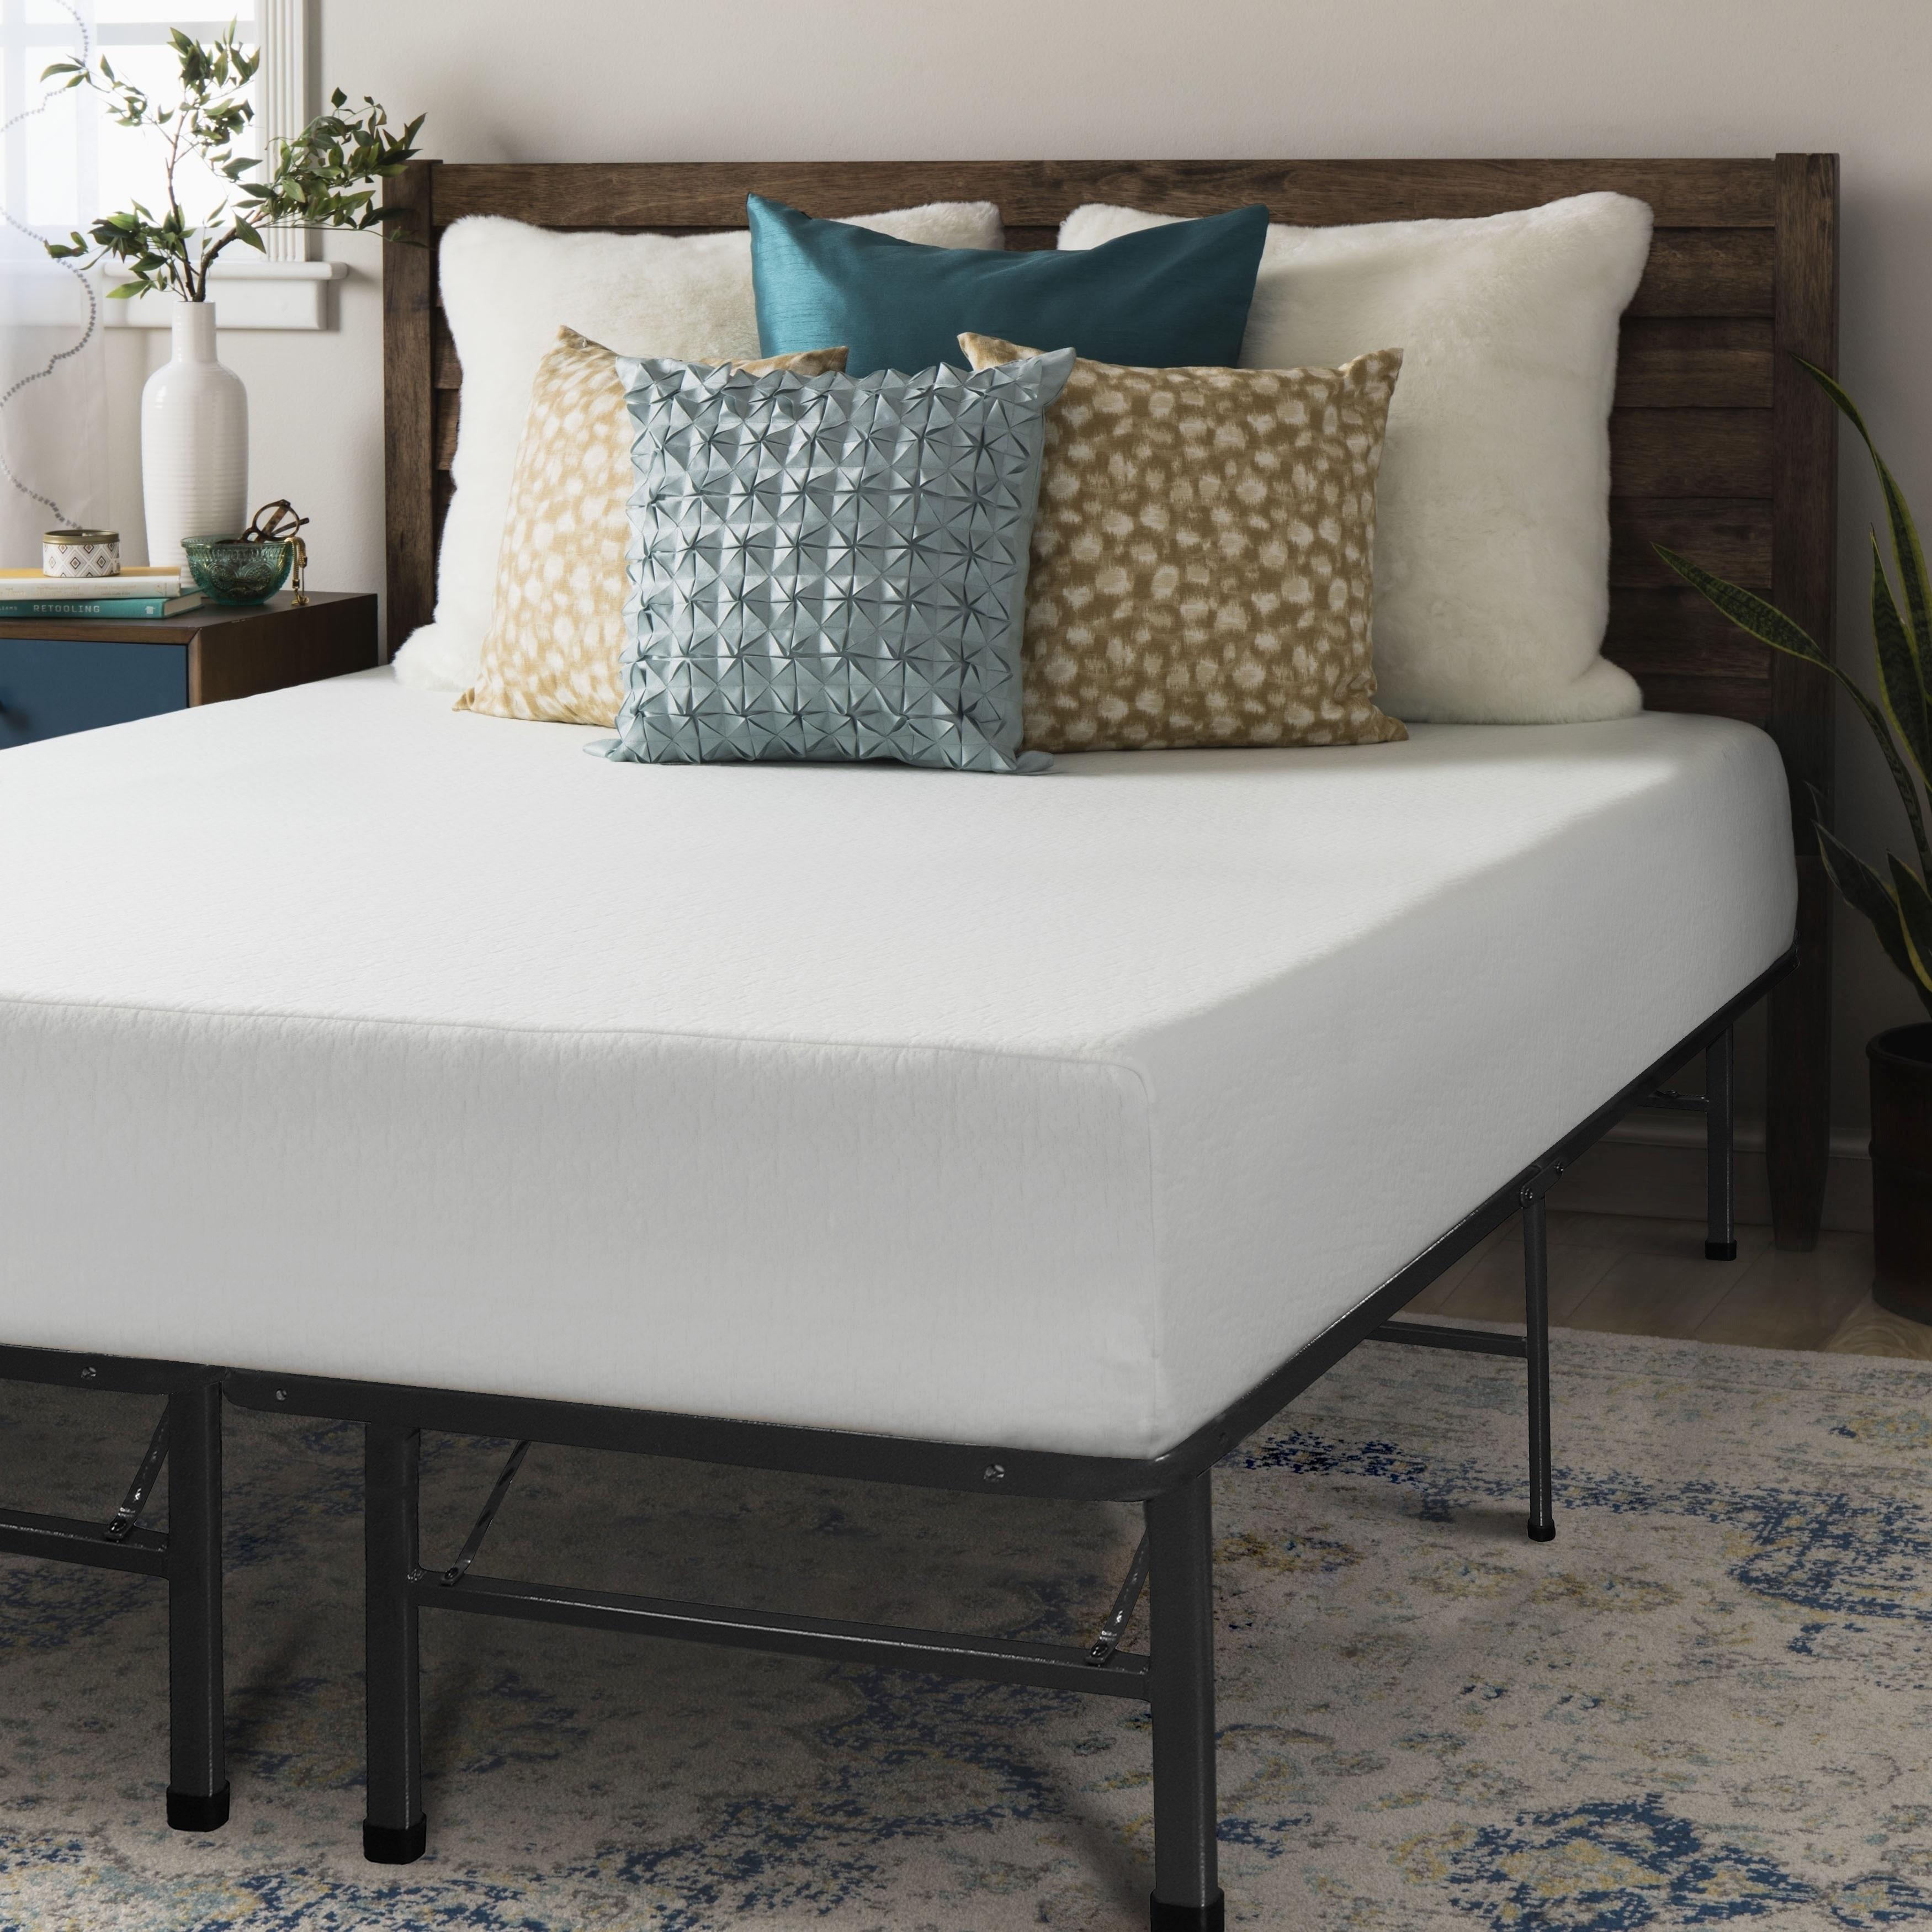 Crown Comfort 10-inch Full-size Memory Foam Mattress Set ...